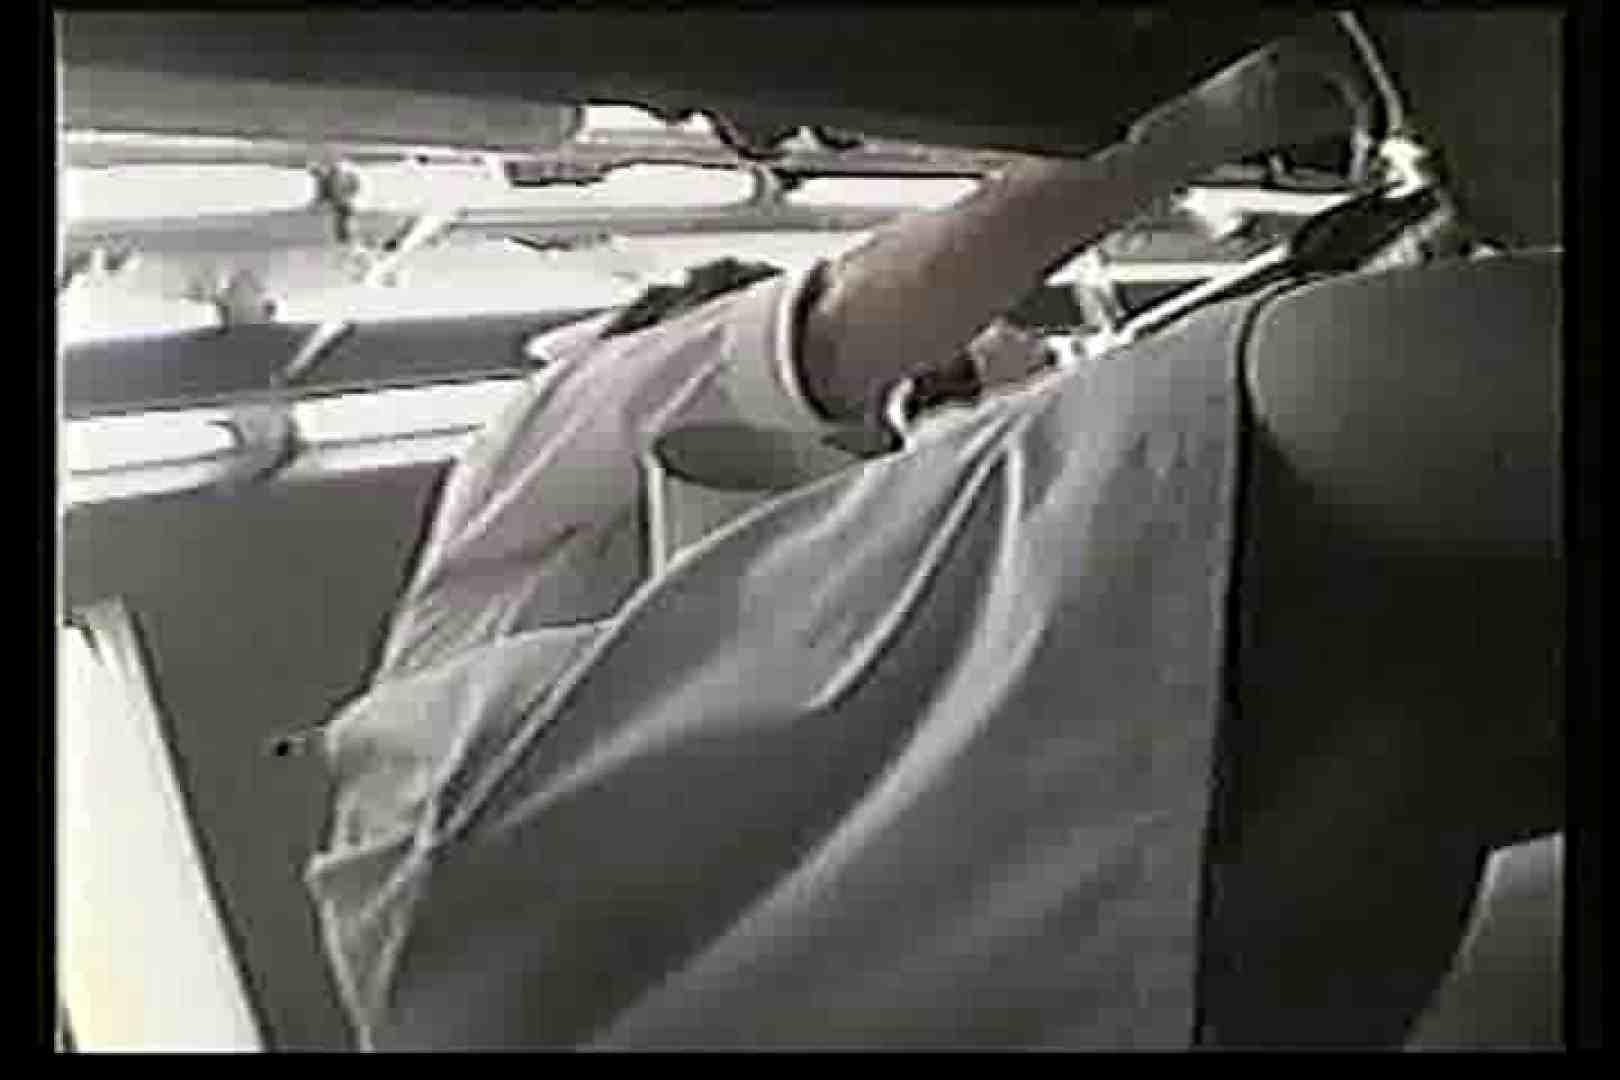 院内密着!看護婦達の下半身事情Vol.2 チラ オメコ無修正動画無料 105PIX 105